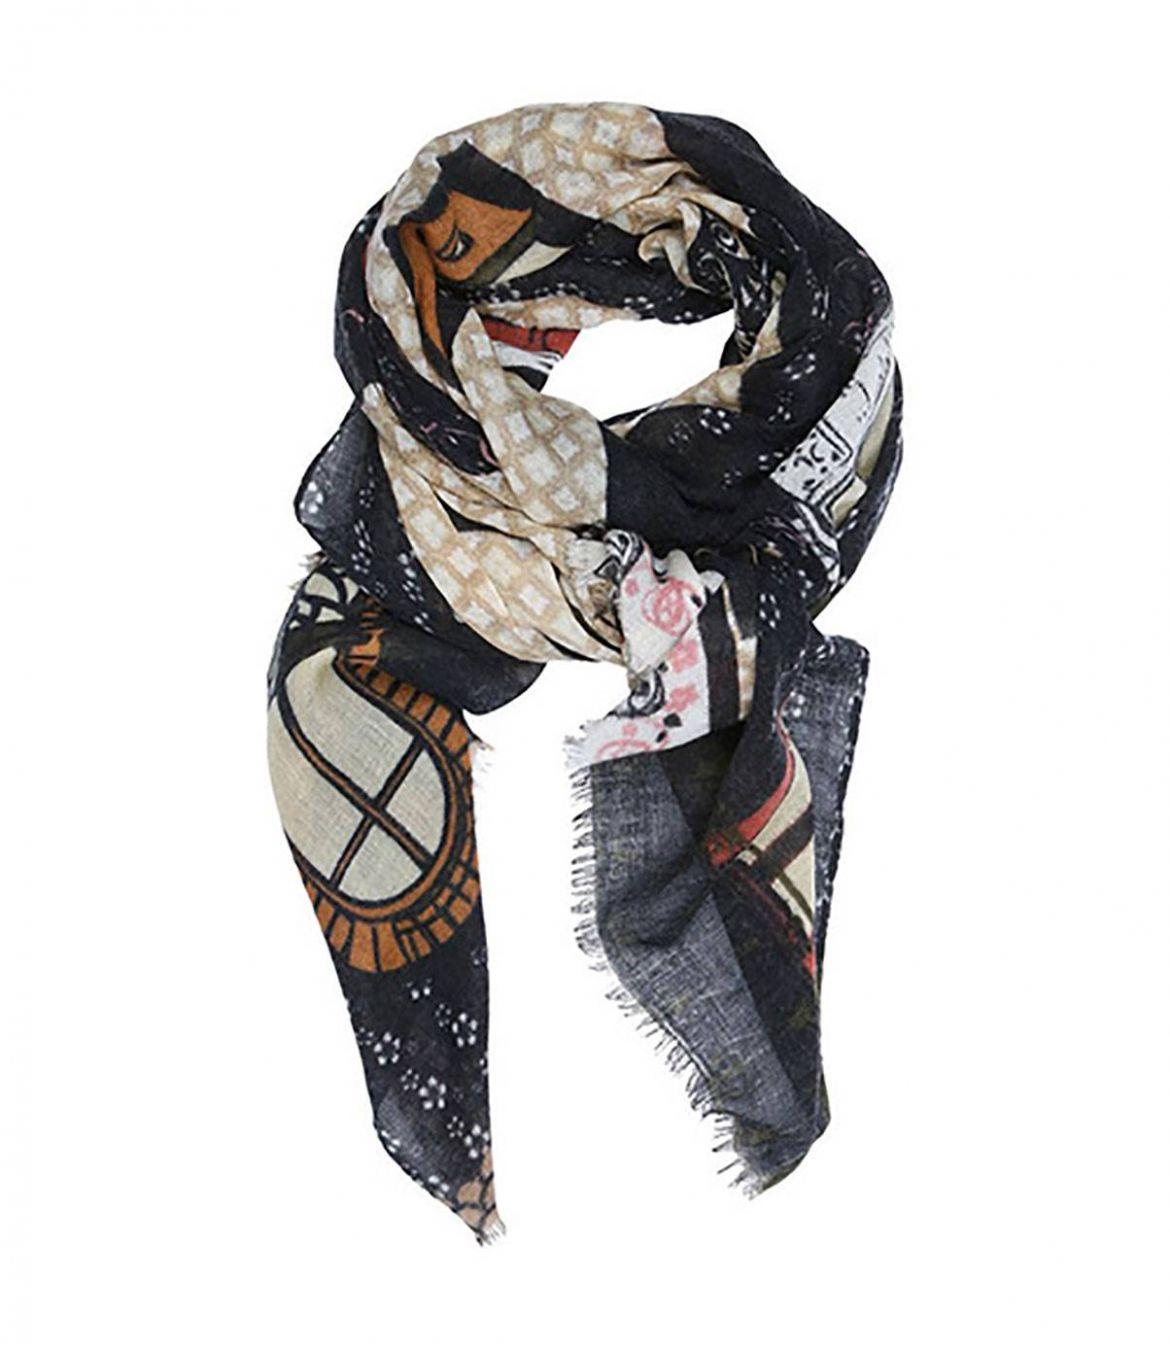 FRONT Women's Wool Scarf 80x190 cm Storiatipic - 1